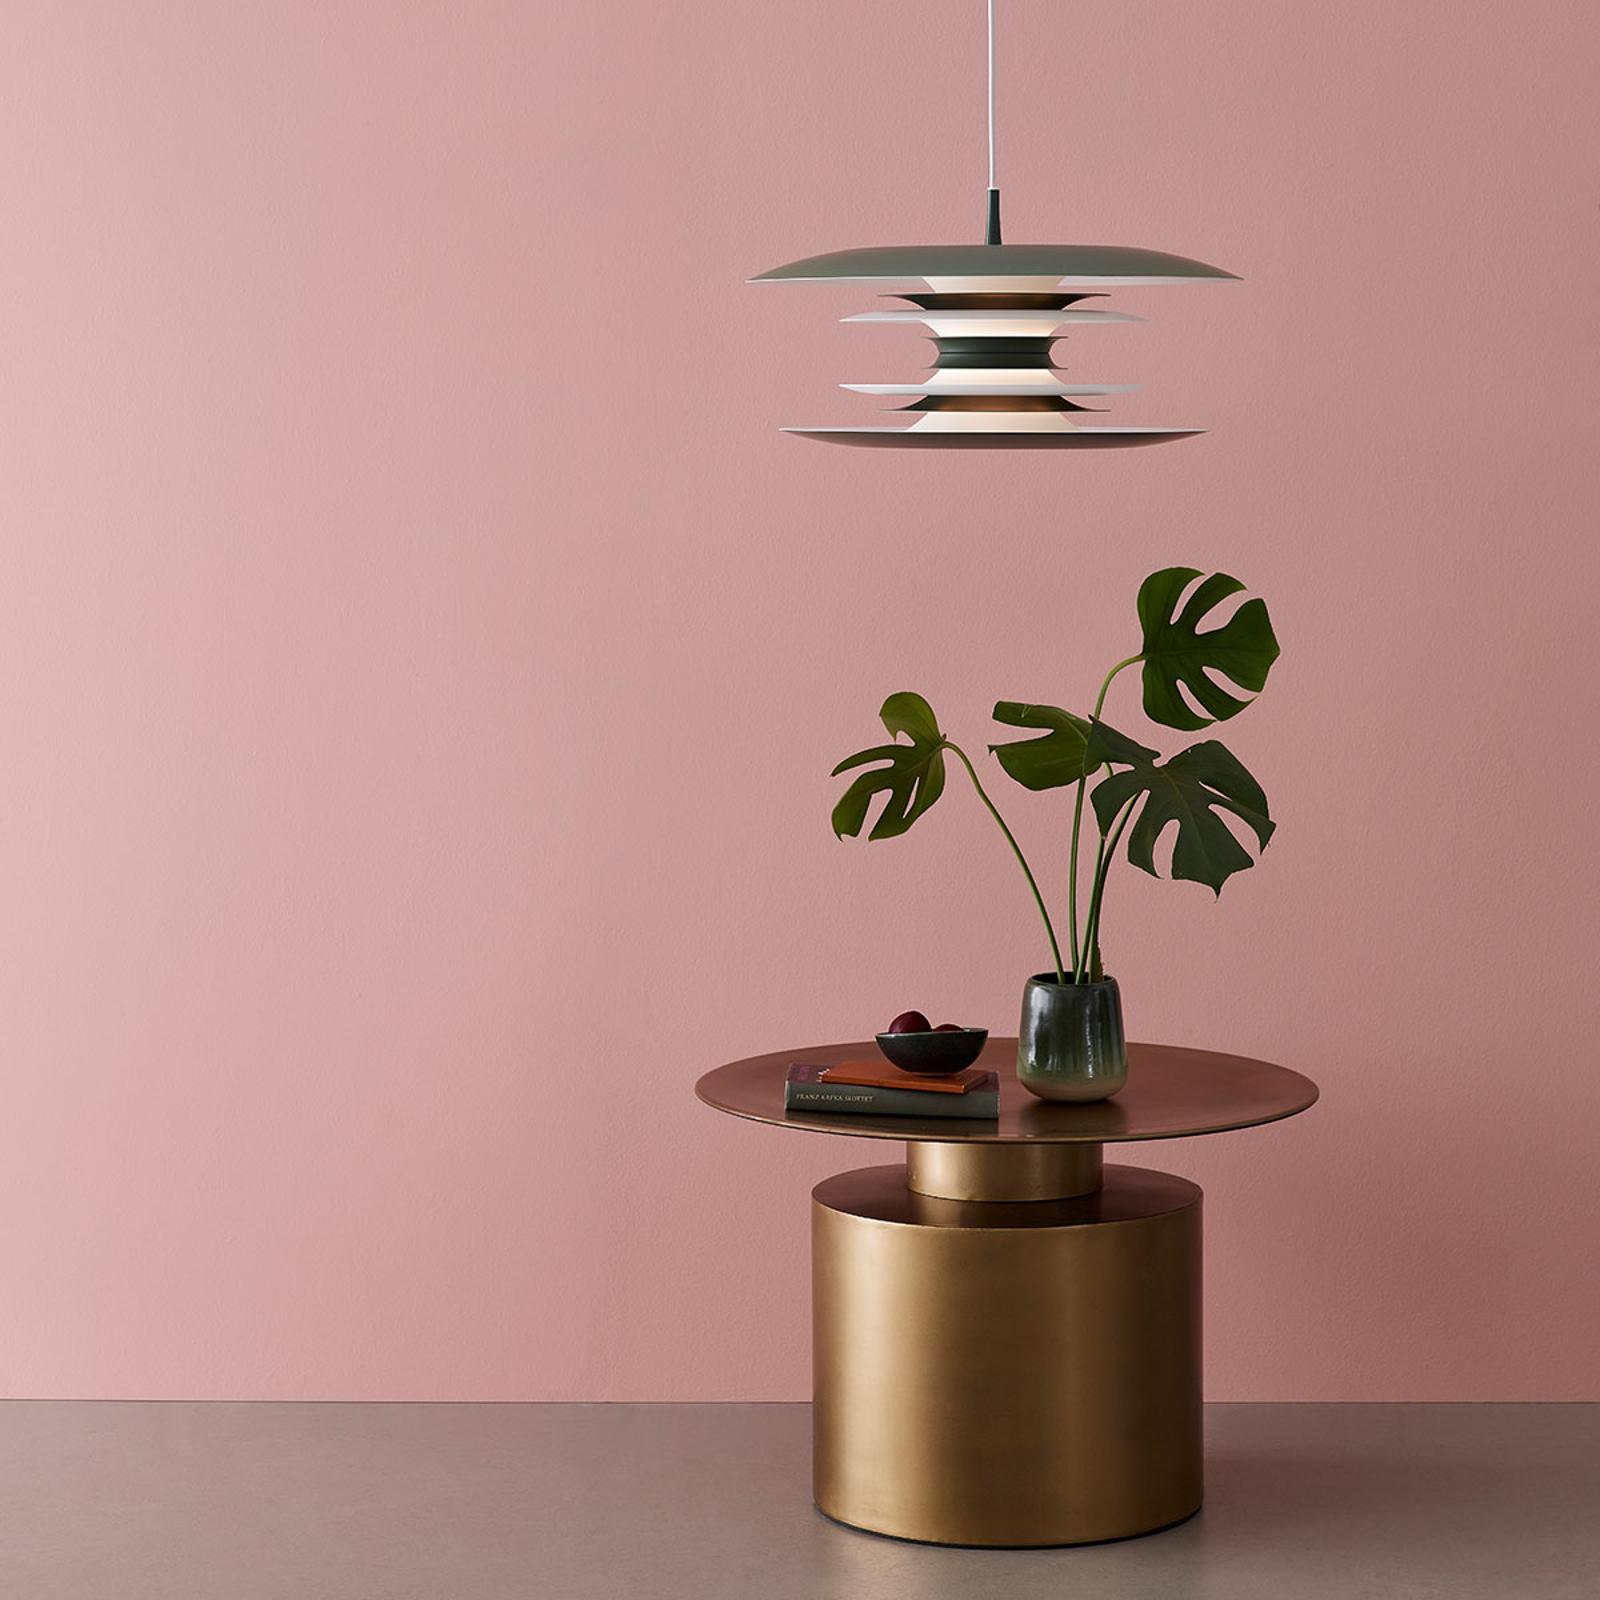 LED hanglamp Diablo Ø 40 cm avocadogroen